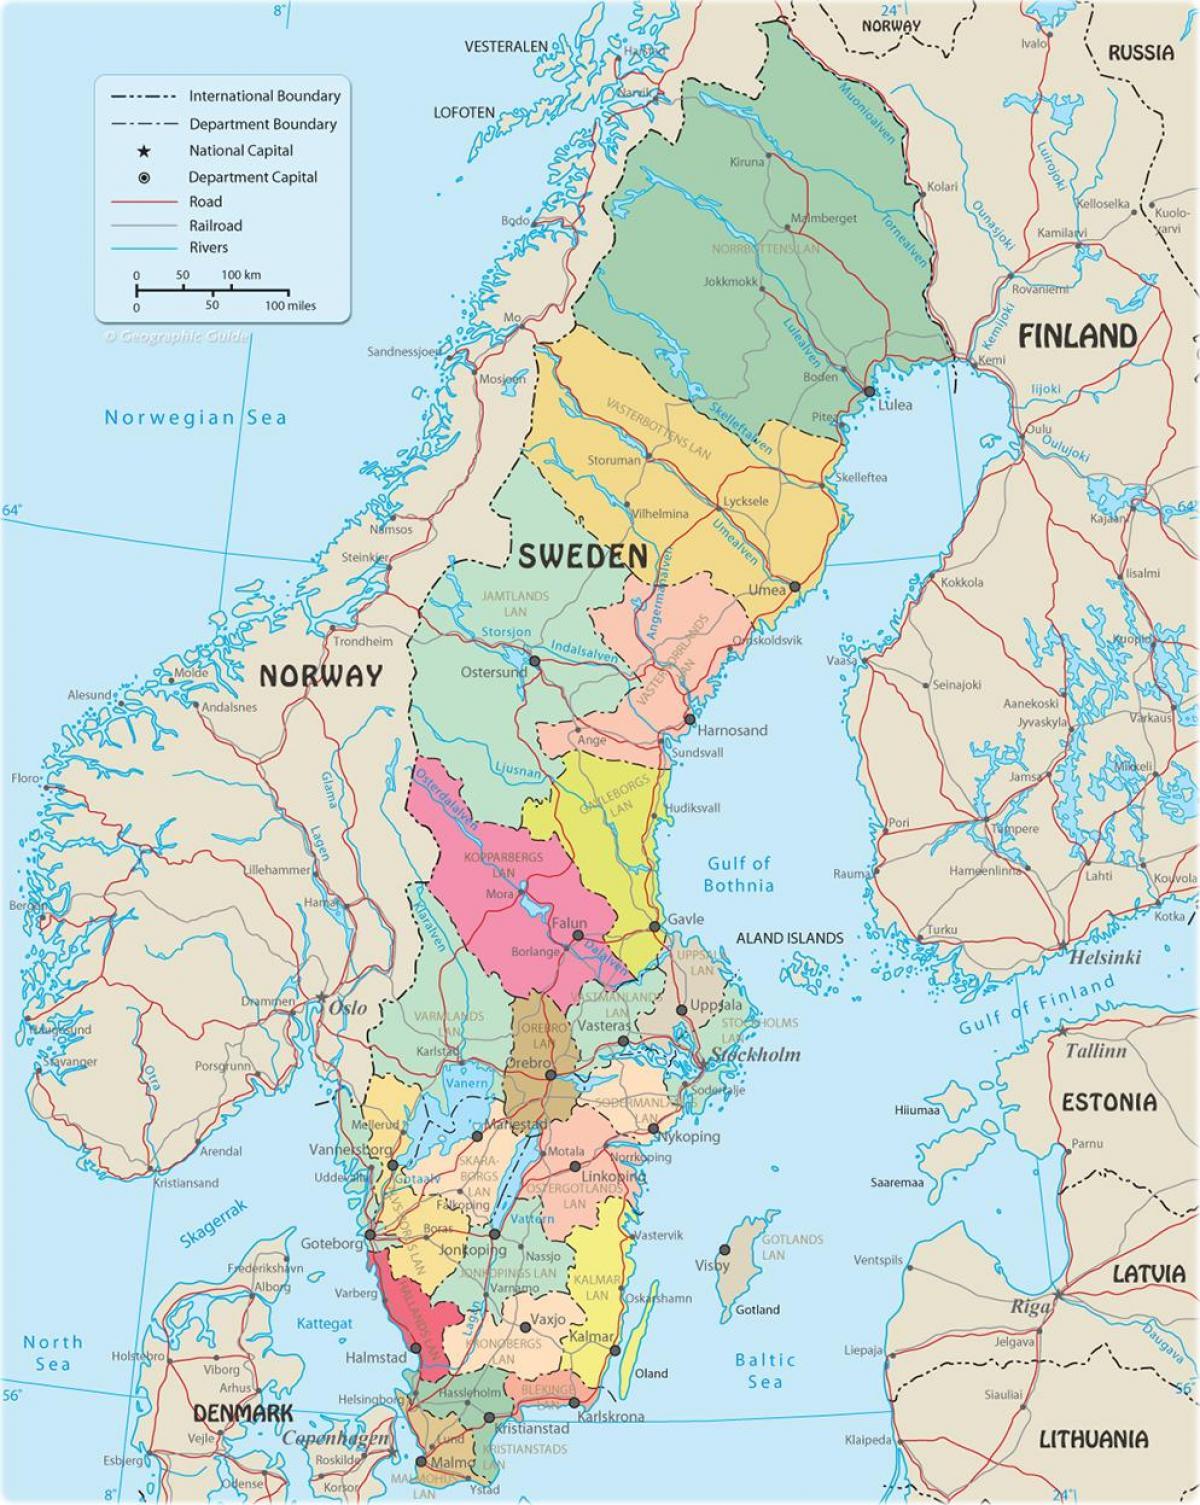 Szwecji Polityczna Mapa Polityczna Mapa Szwecji Europa